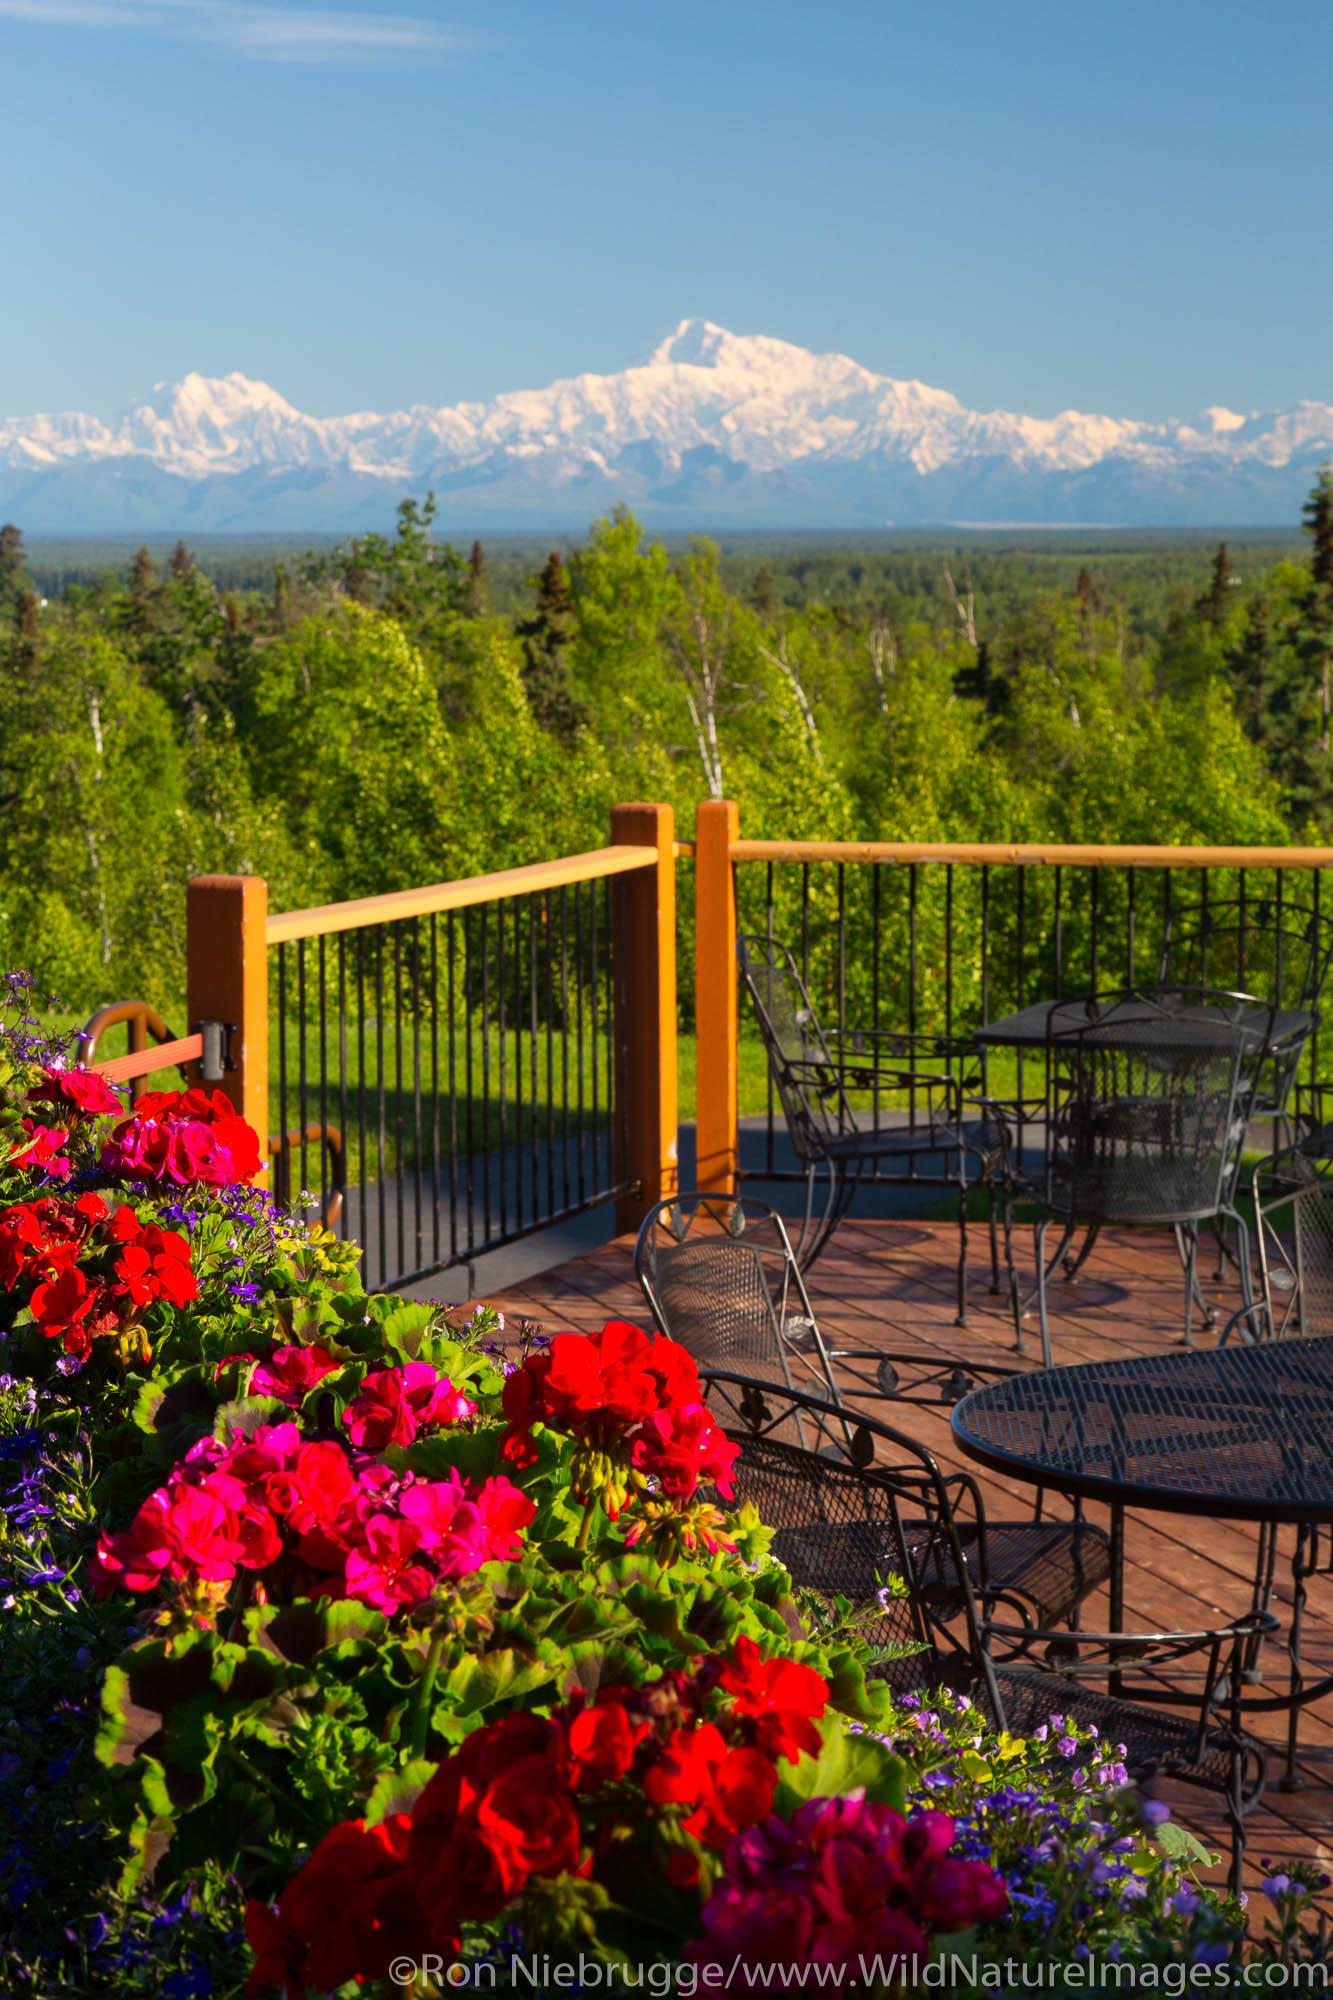 Talkeetna Alaskan Lodge, Talkeetna, Alaska.